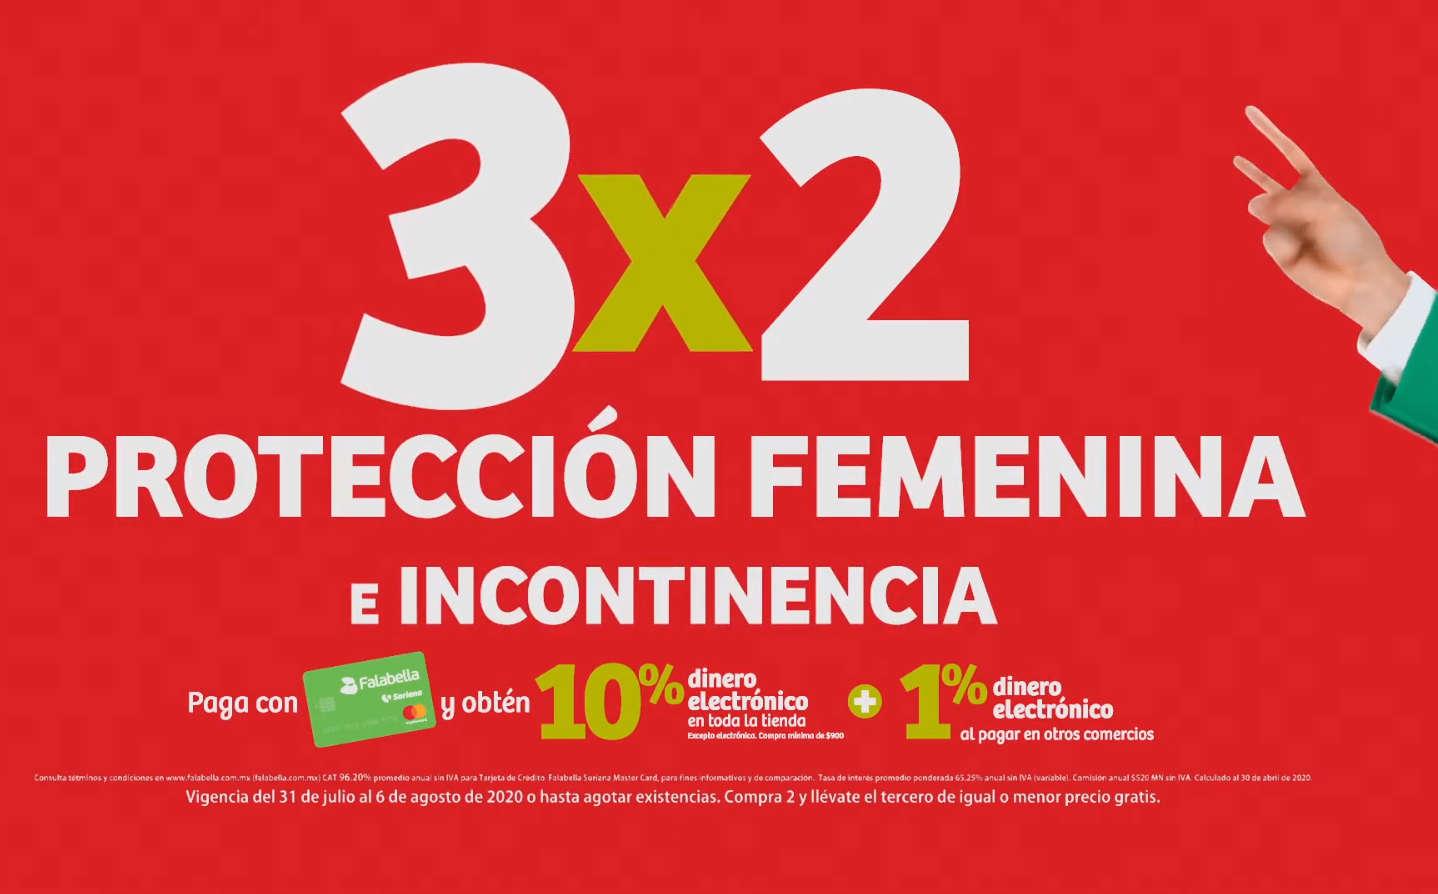 Soriana Julio Regalado 2020: 3×2 en protección femenina e incontinencia